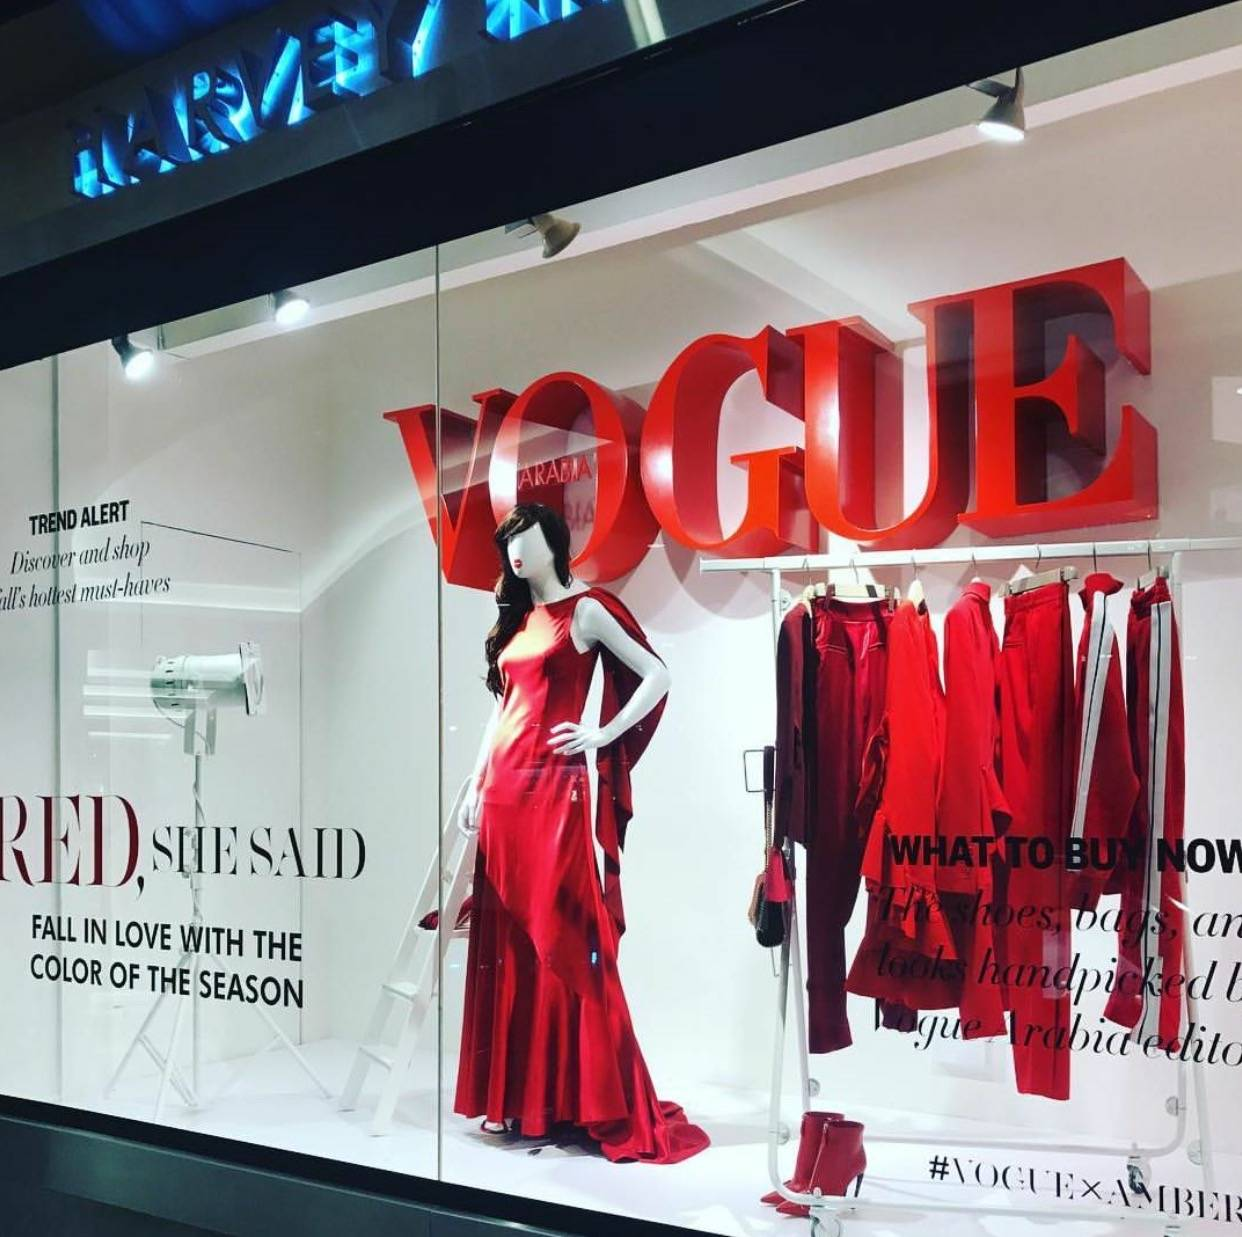 Vogue, vogue typography, vogue fonts, Vogue typeface, Lingerie Typeface, Moshik Nadav, Typographer, Best fonts 2020, Sexy fonts, Sexy logos